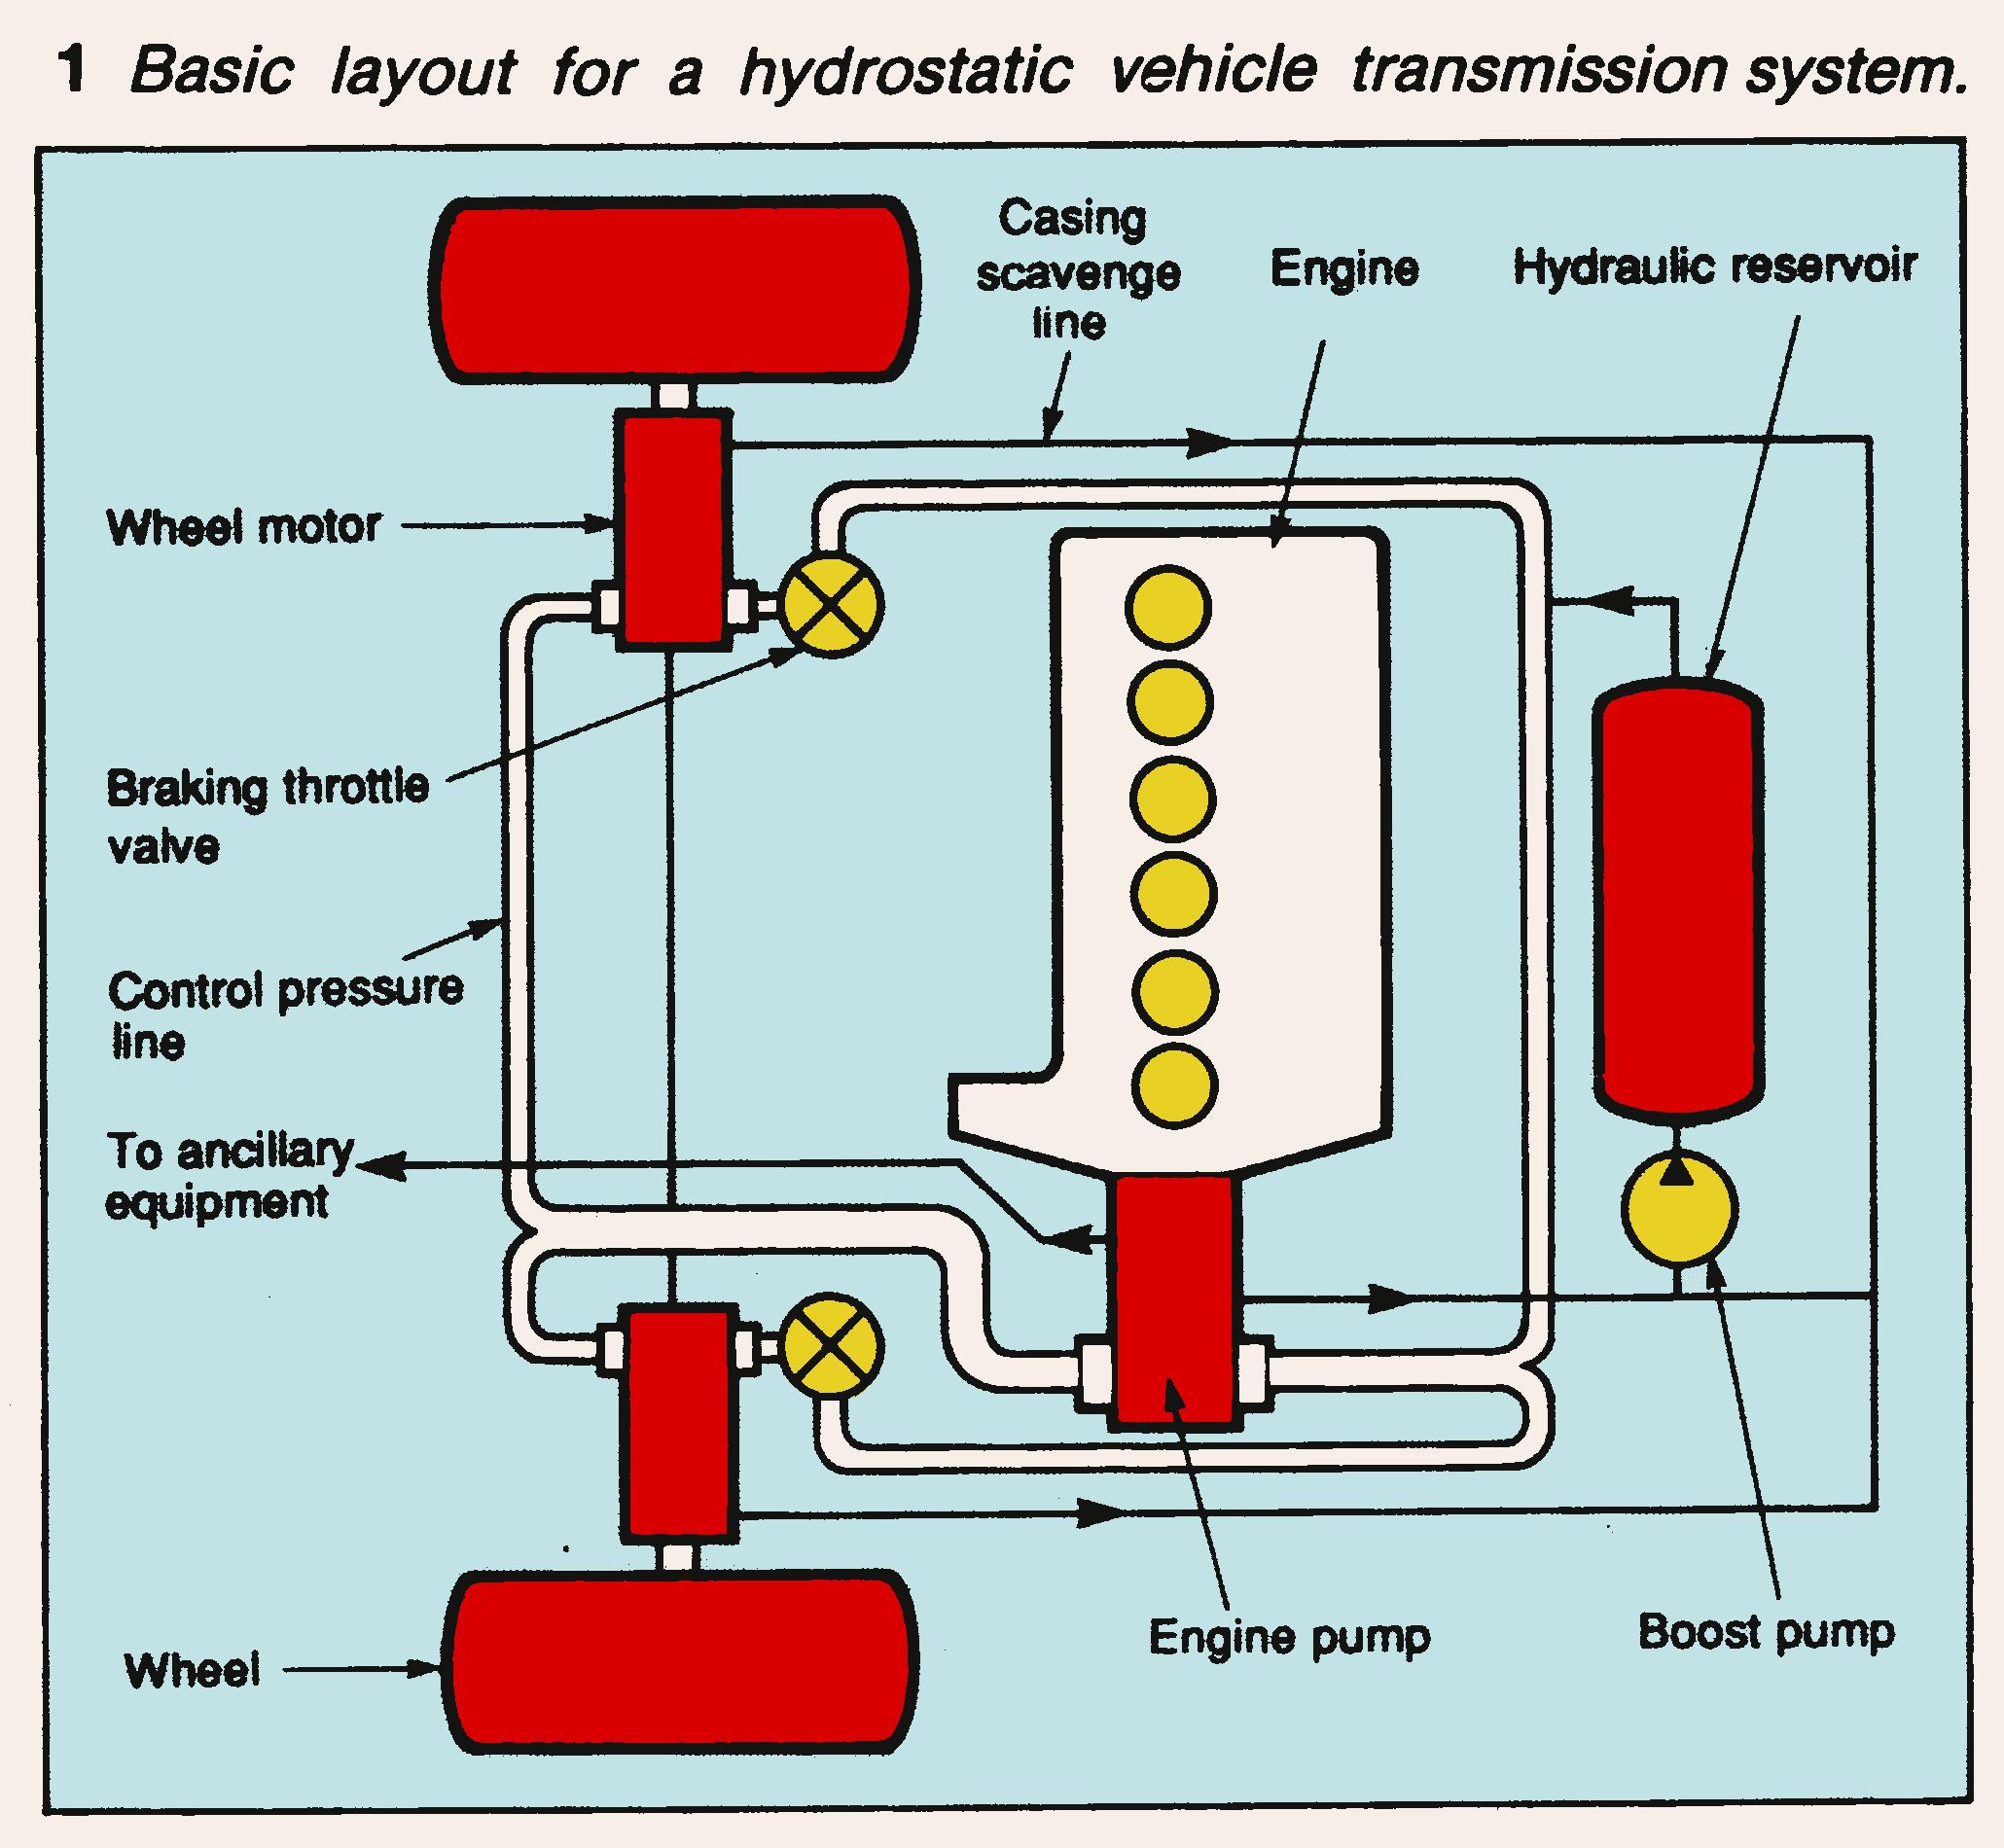 basic layout for a hydrostatic vehicle transmission system